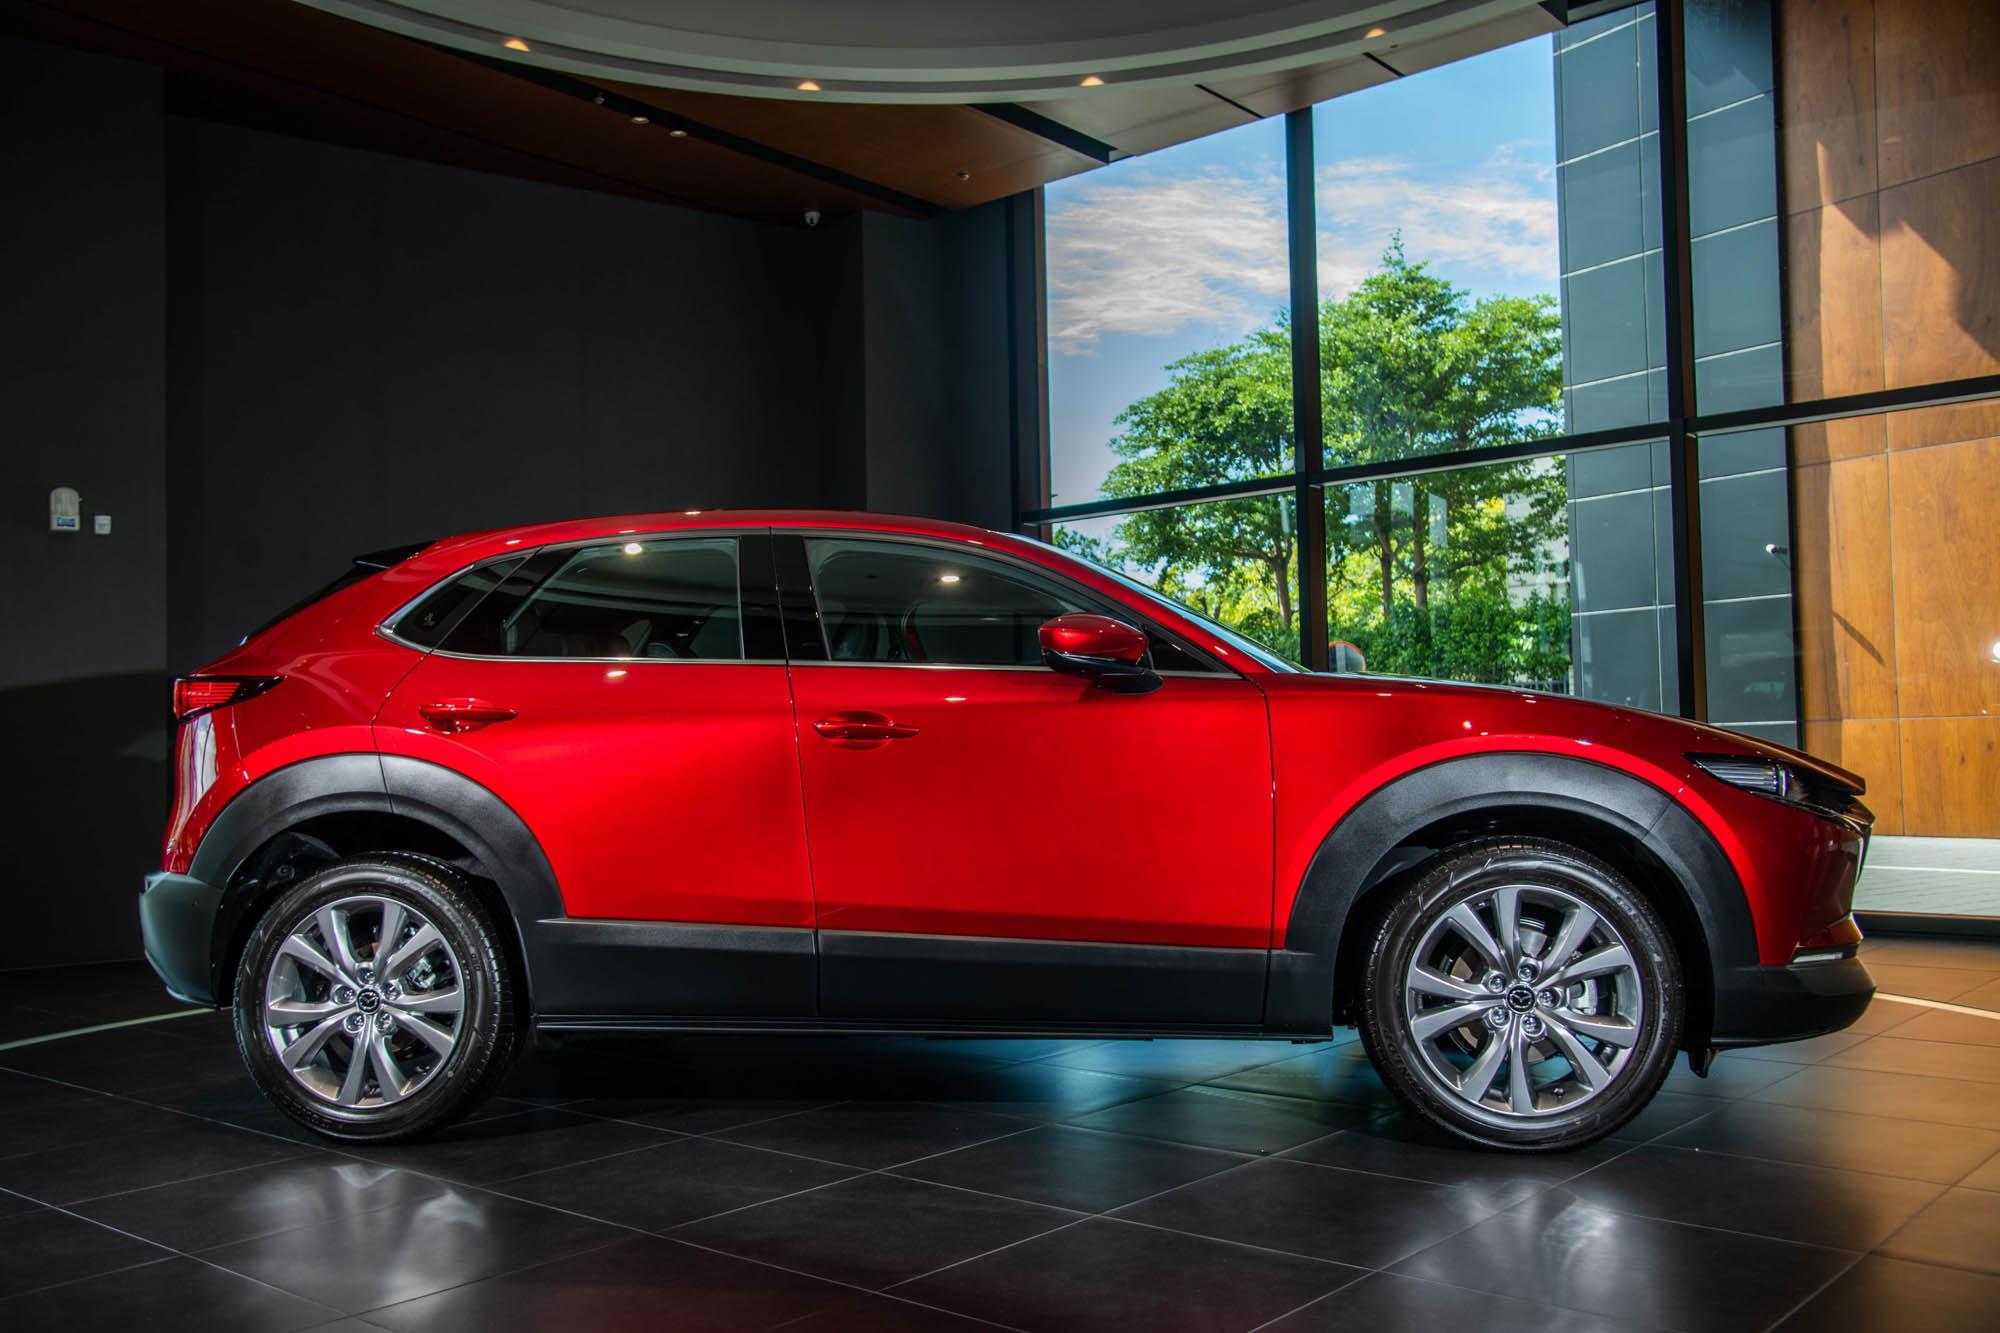 CX-30 將於本月底正式發表,對於跨界休旅車有購車意願的買家,敬請期待後續報導!